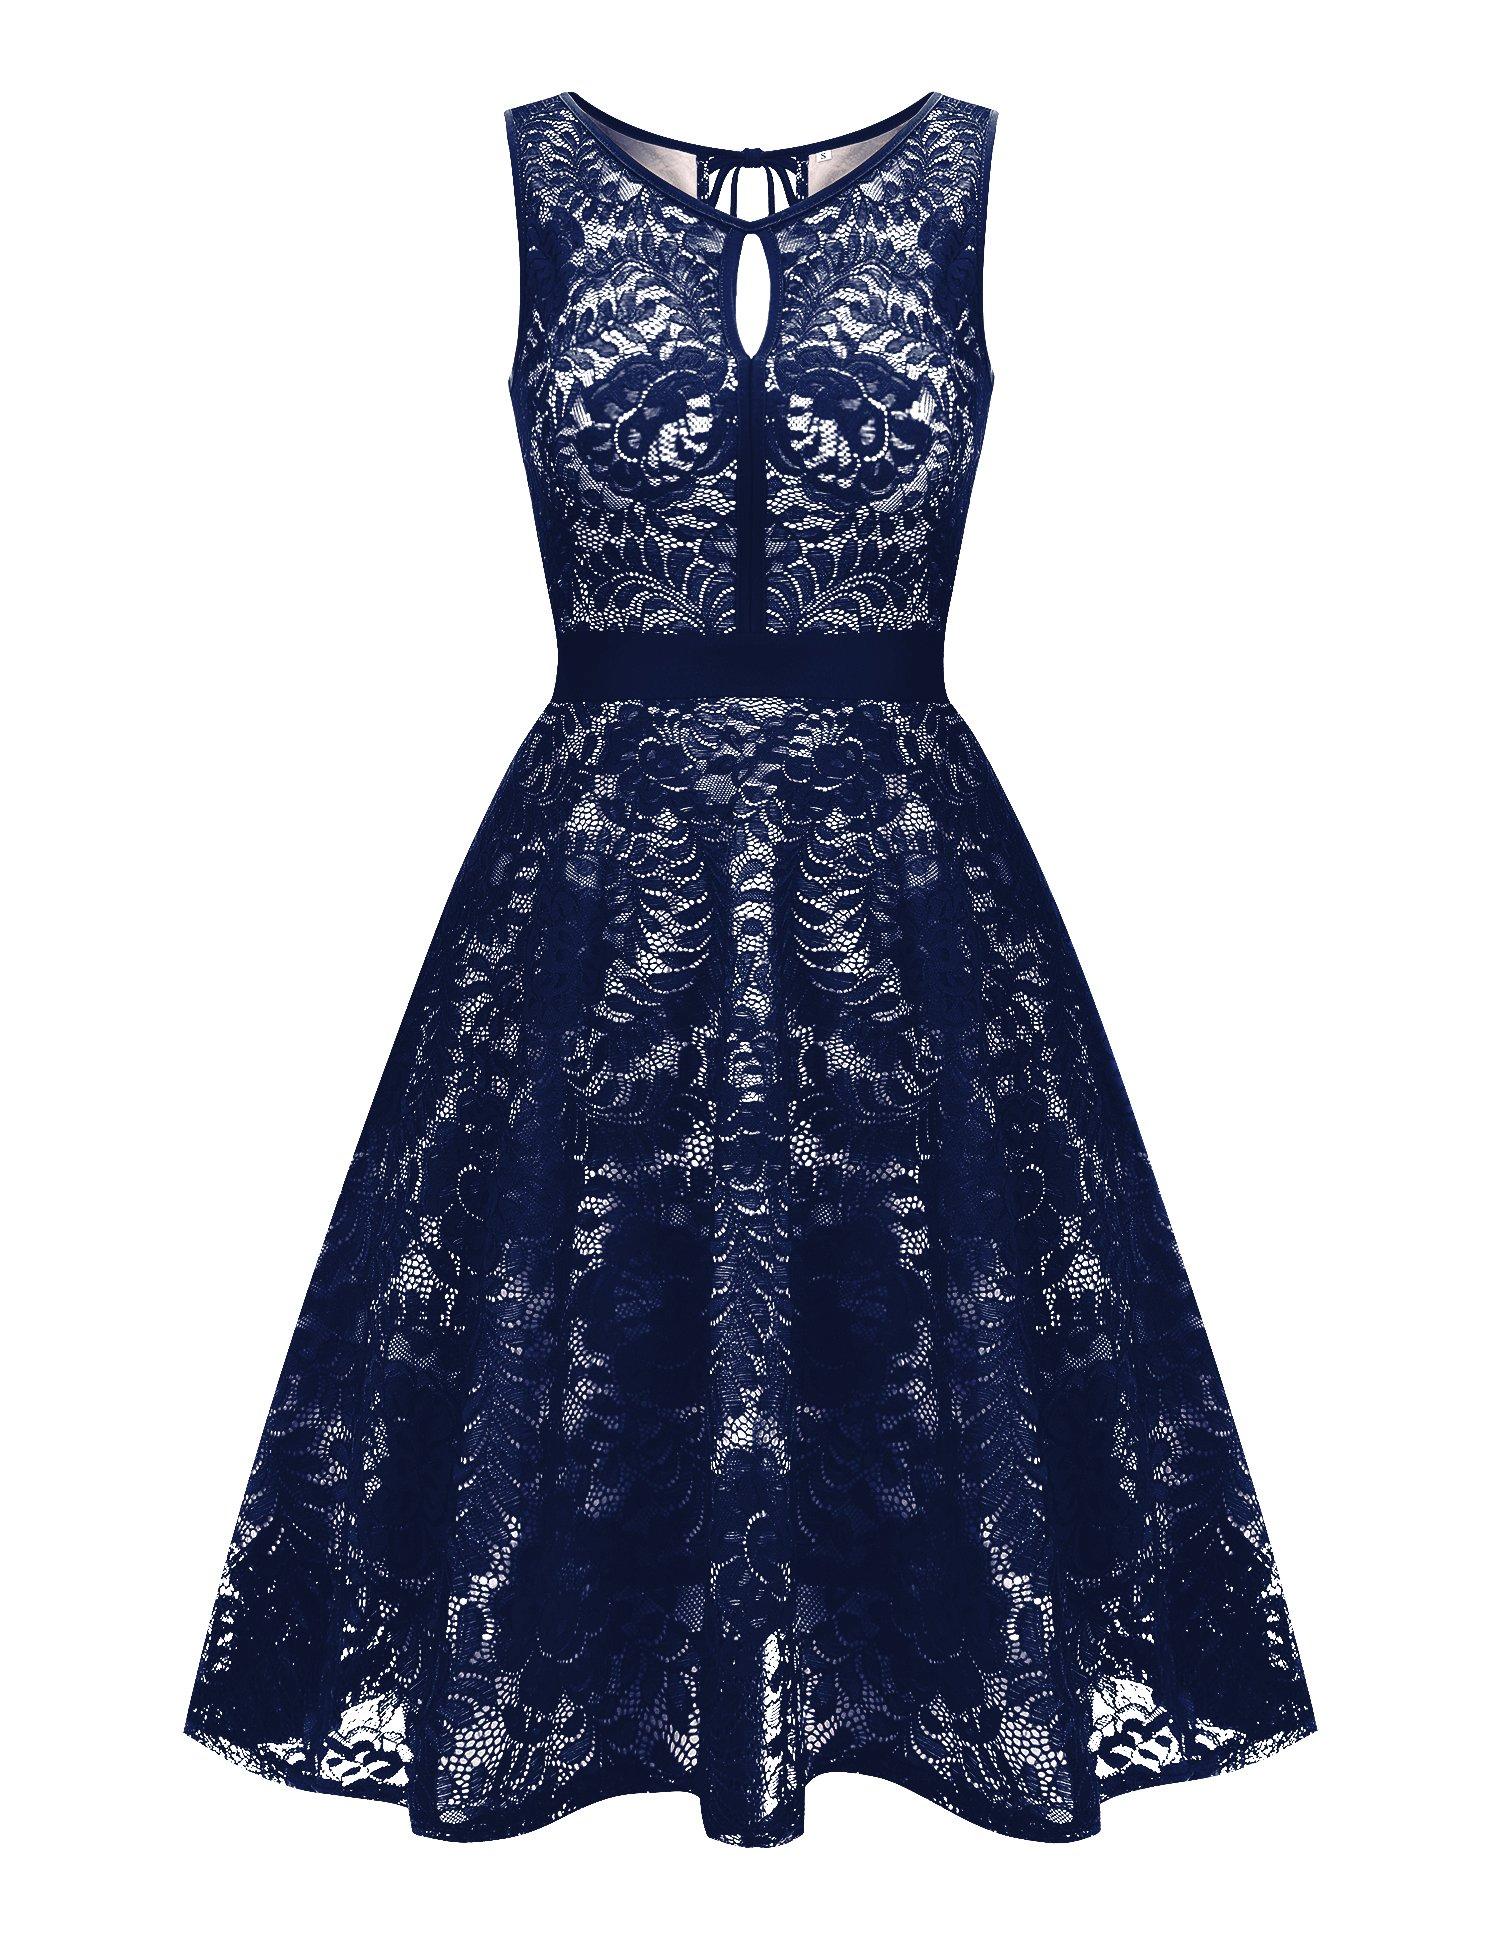 Uniboutique Women's Floral Lace Sleeveless Elastic Waist Pleated Swing Dress Navy Blue XL